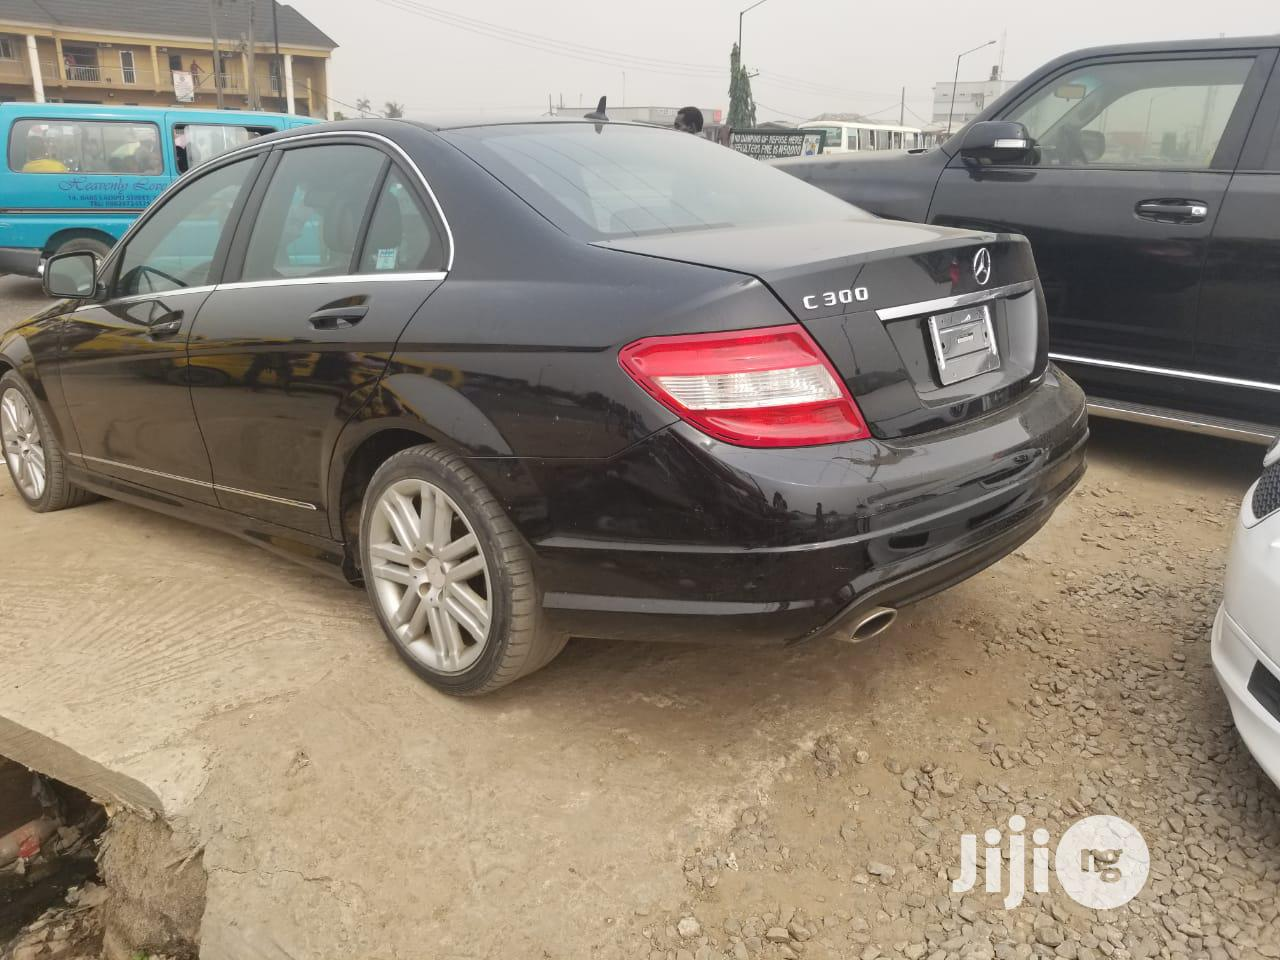 Mercedes-Benz C300 2008 Black   Cars for sale in Abule Egba, Lagos State, Nigeria